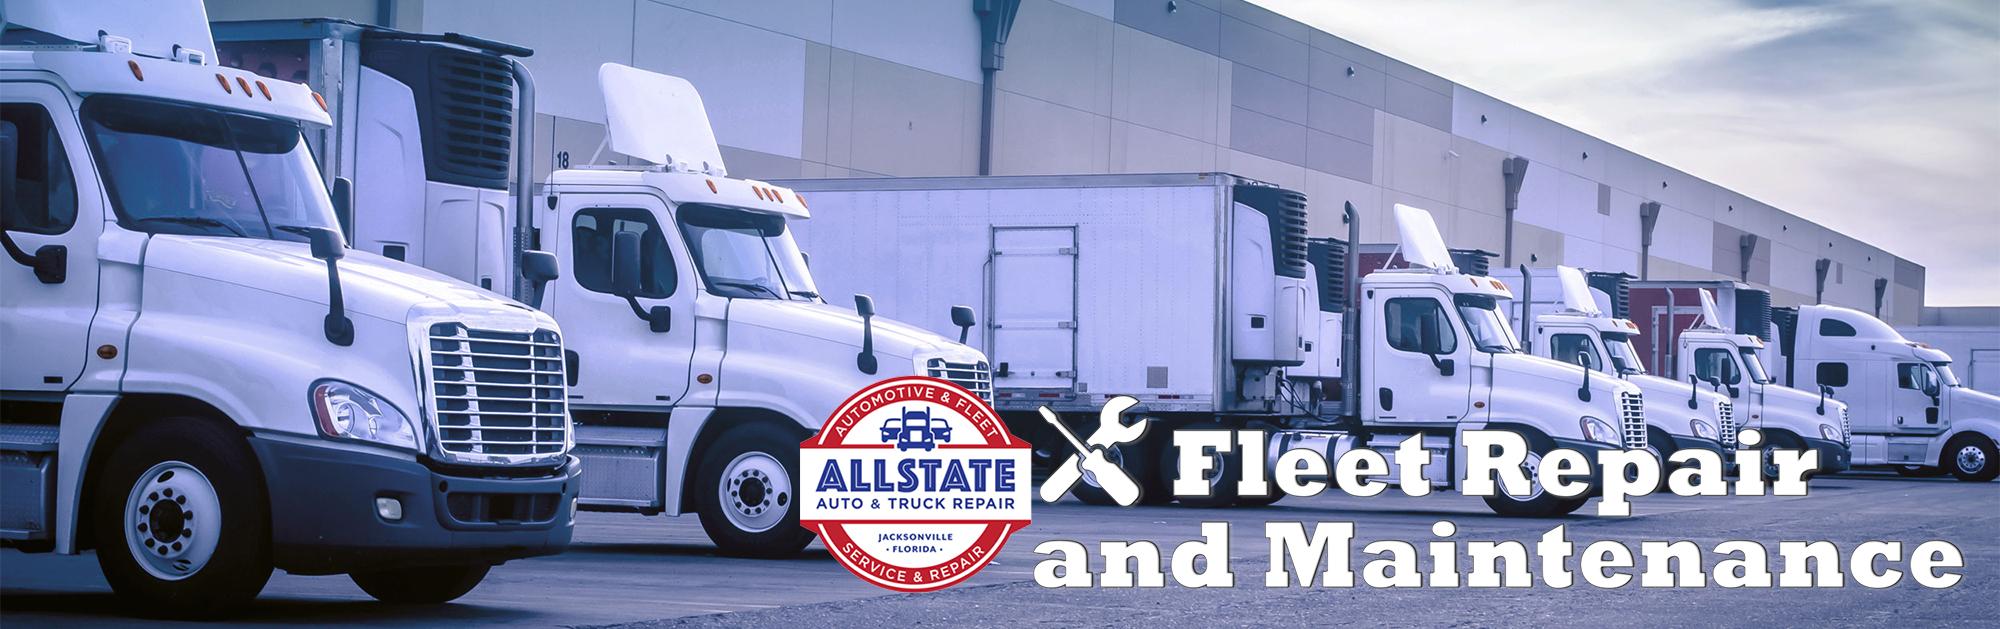 Allstate Auto Truck Repair Inc Jacksonville Fl Fleet